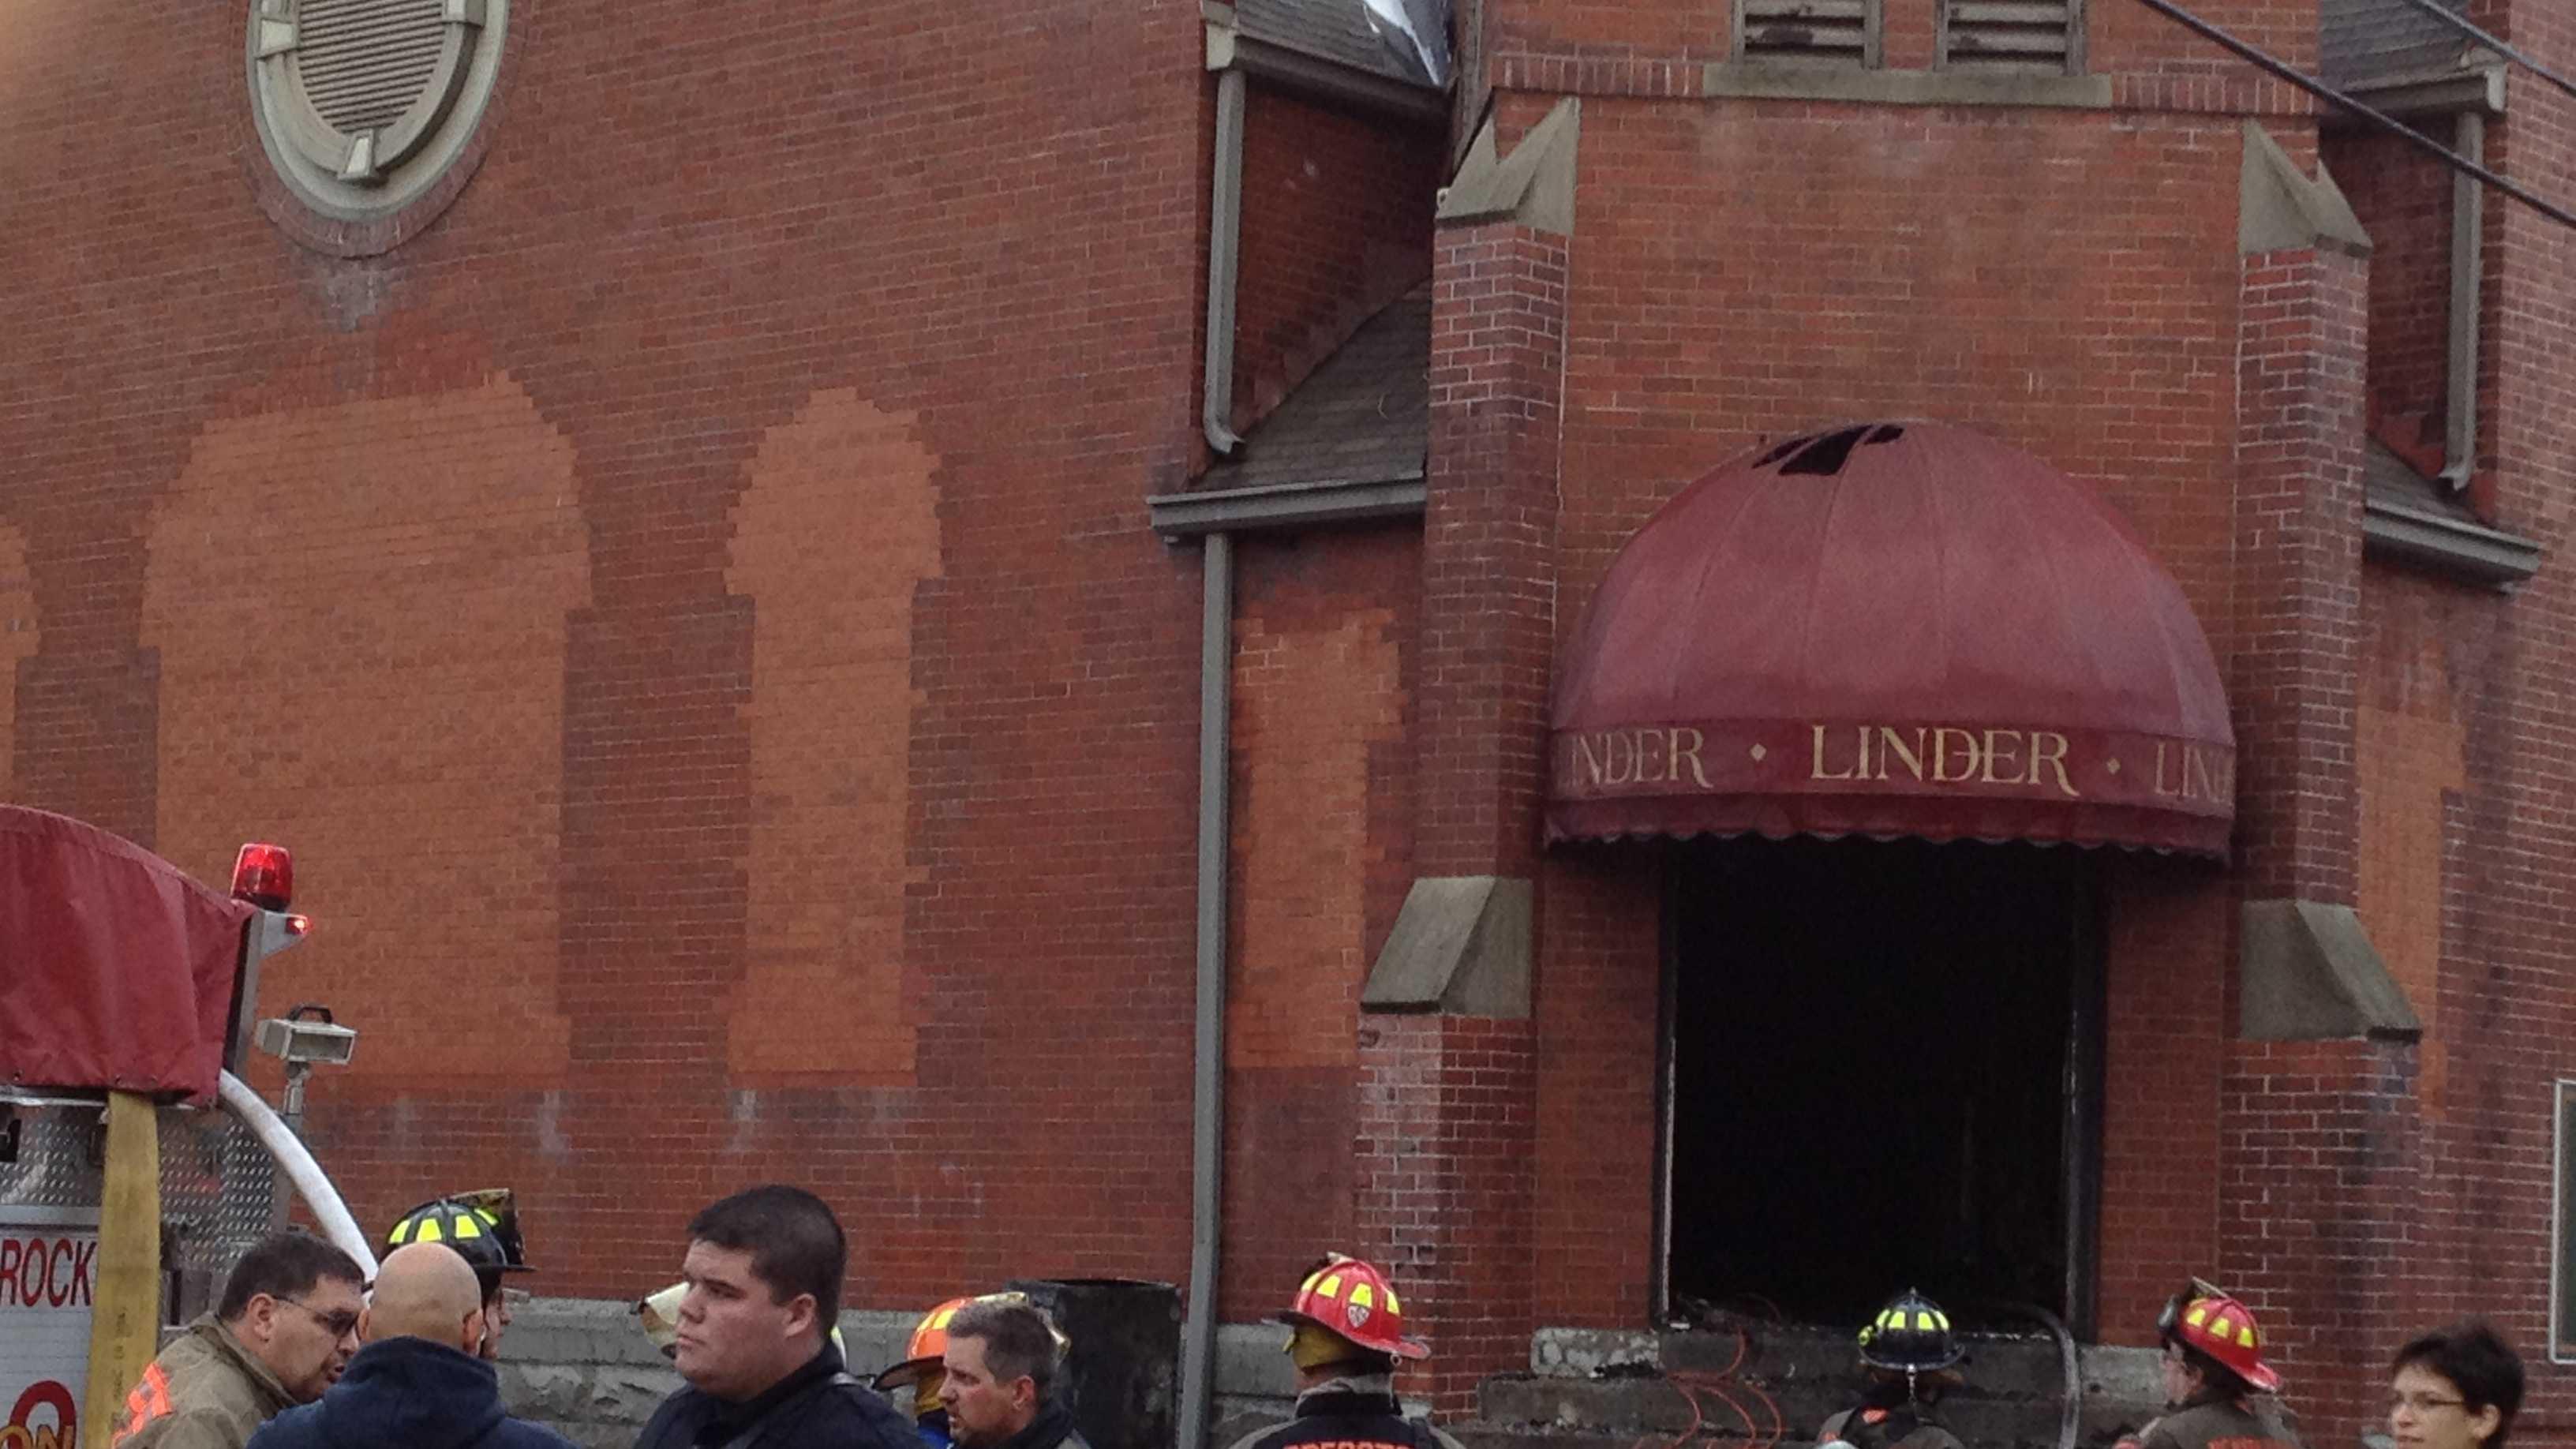 Linder's fire